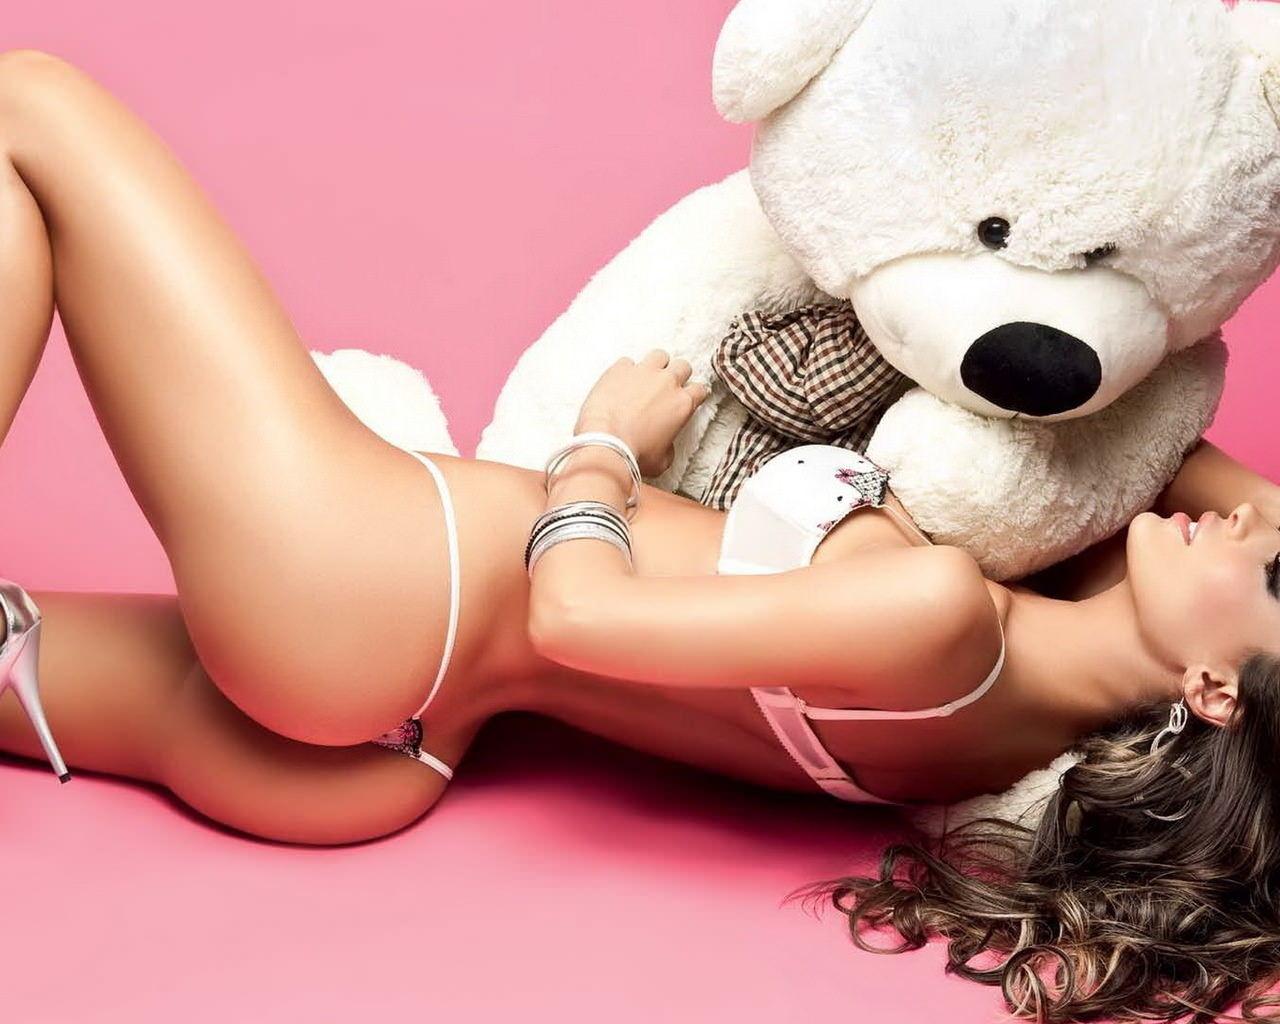 Секси девушки с игрушками 25 фотография